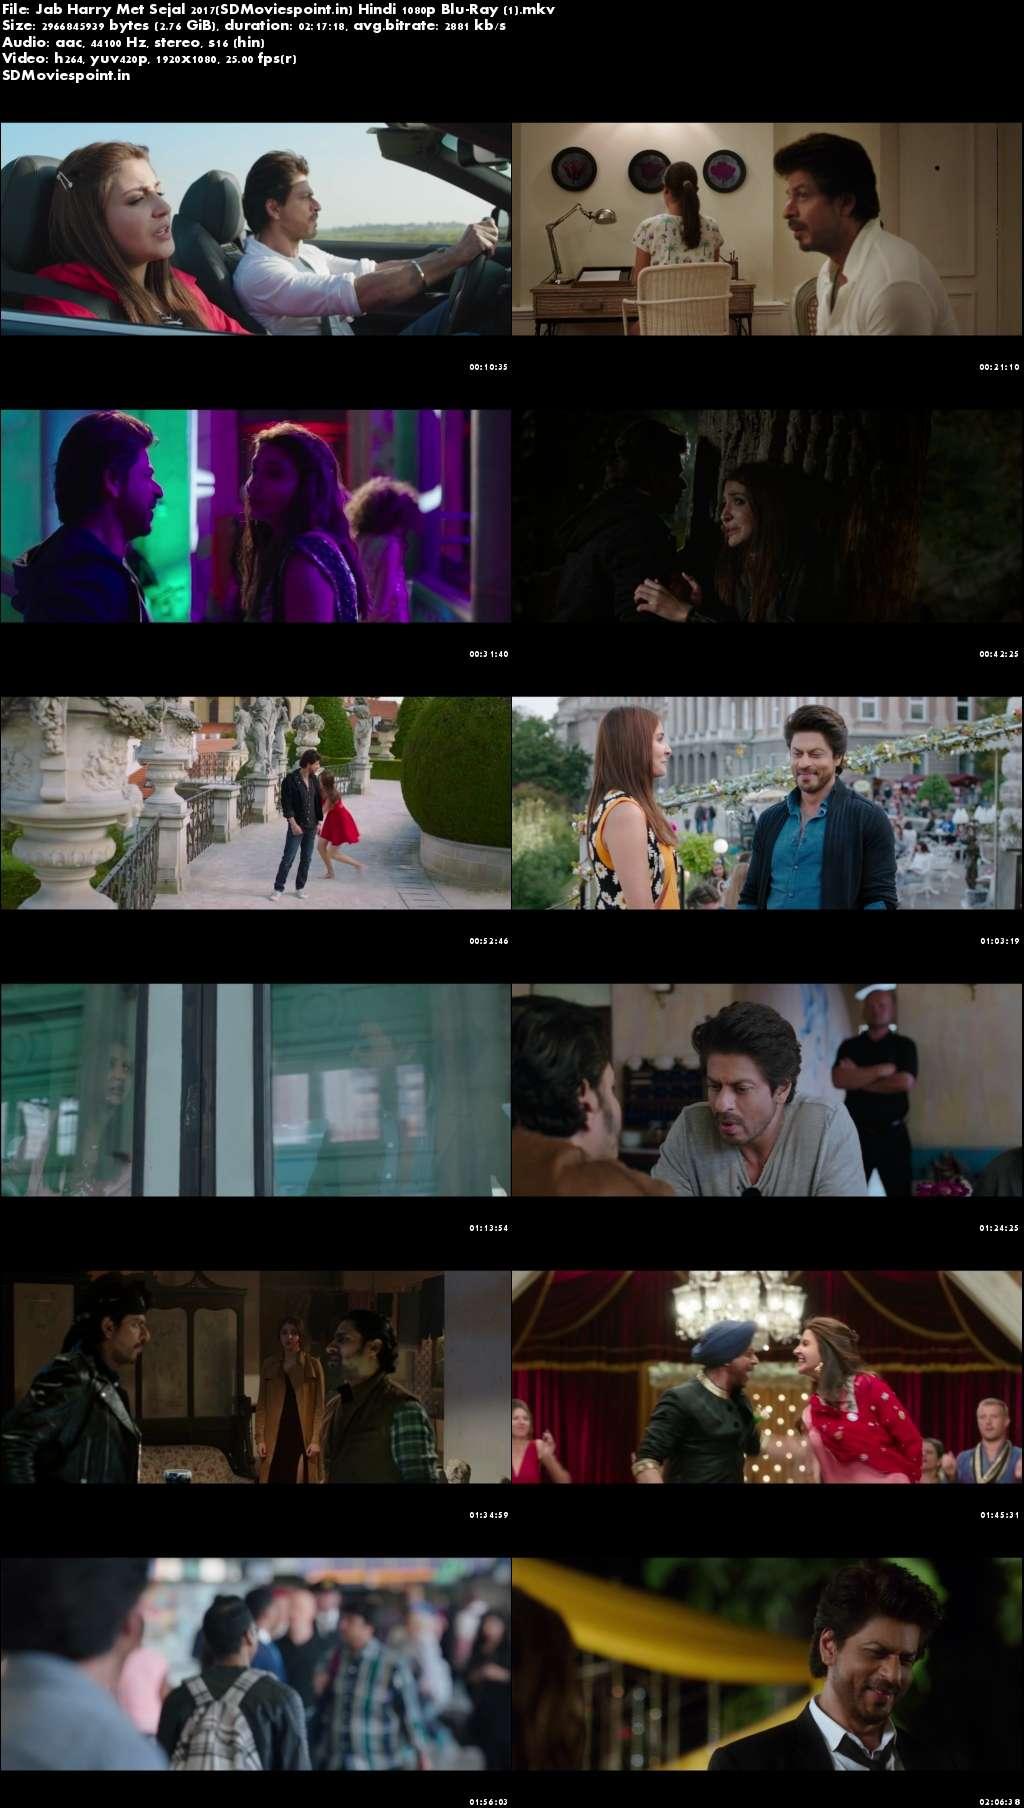 Screen Shots Jab Harry Met Sejal 2017 Full Hindi Movie Download HD 1080p Blu-Ray